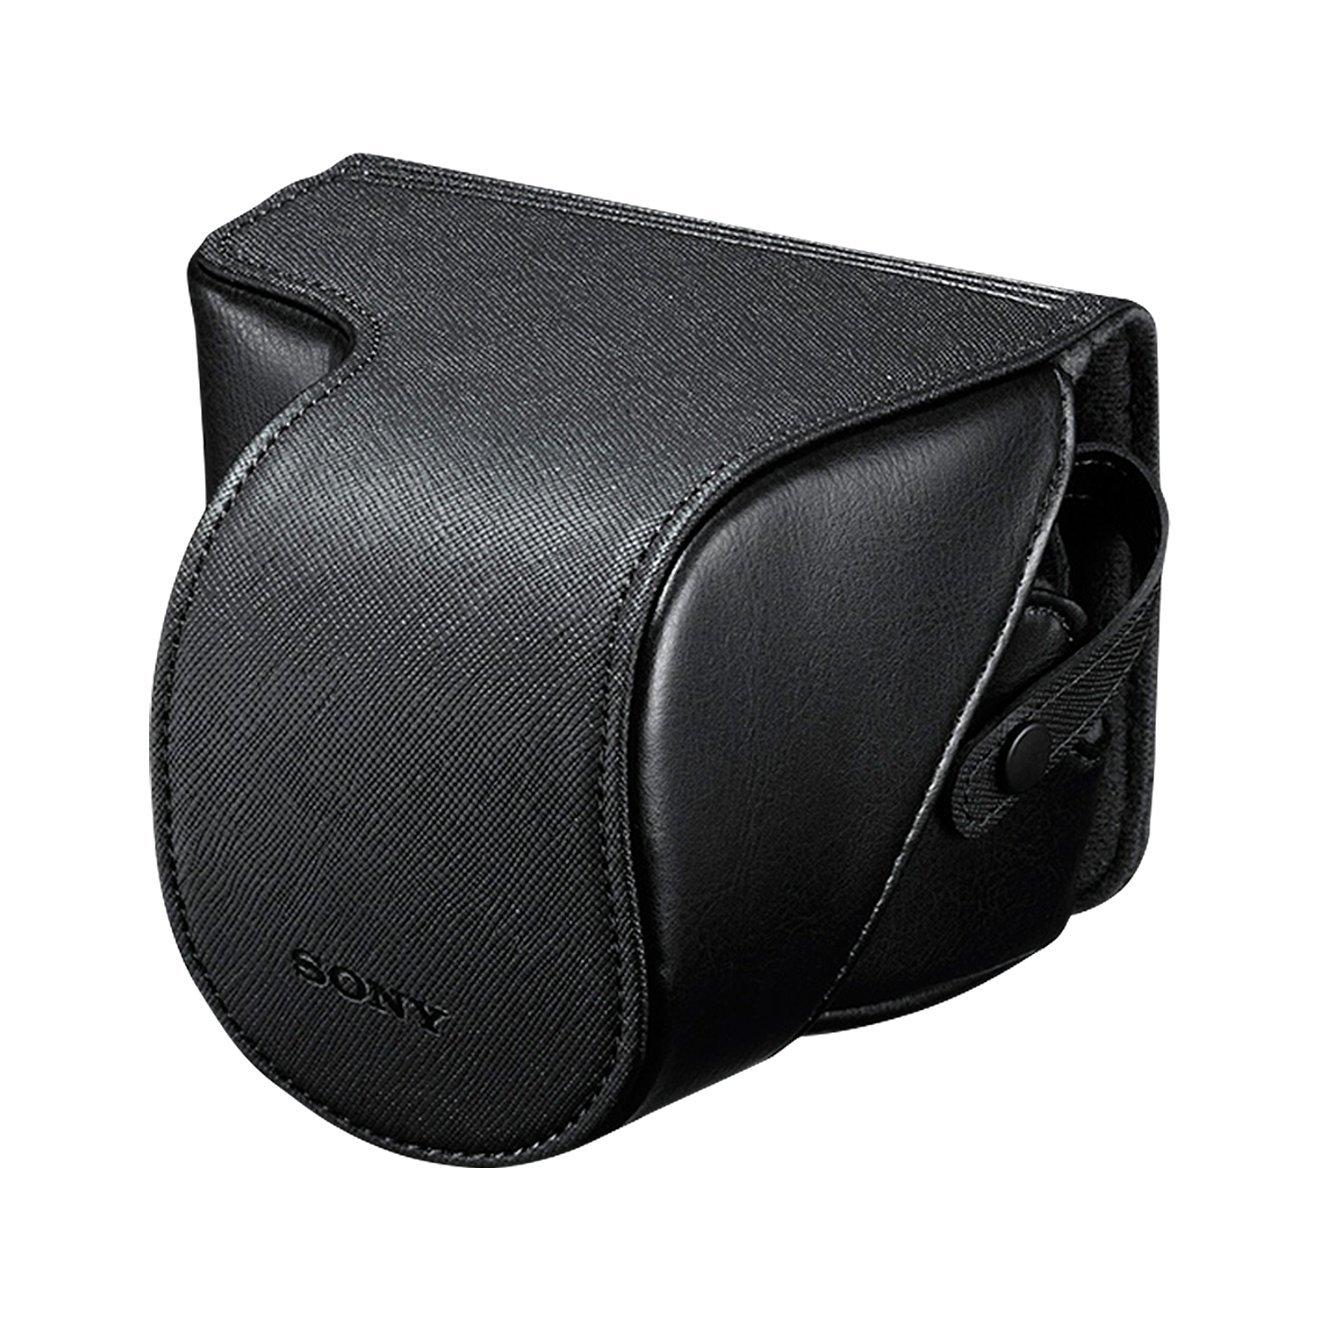 Sony LCSEJC3/B Custom Lens Jacket for Alpha NEX (Black)